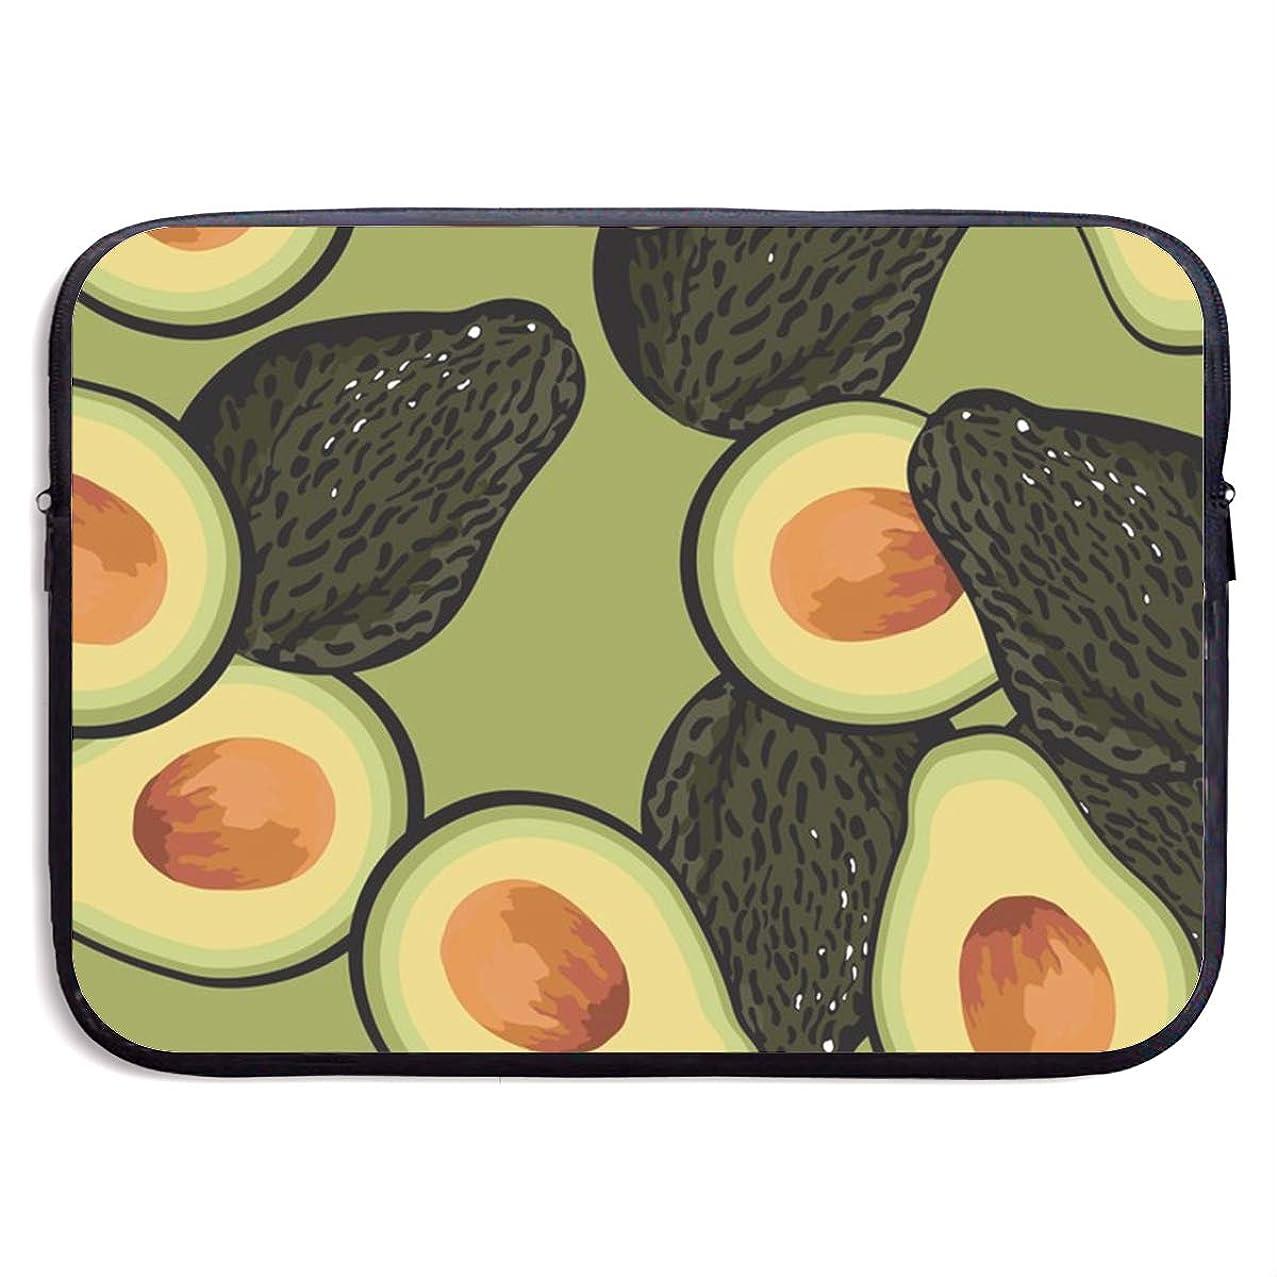 DGE230htD Avocado Laptop Sleeve Case 15.6 Inch